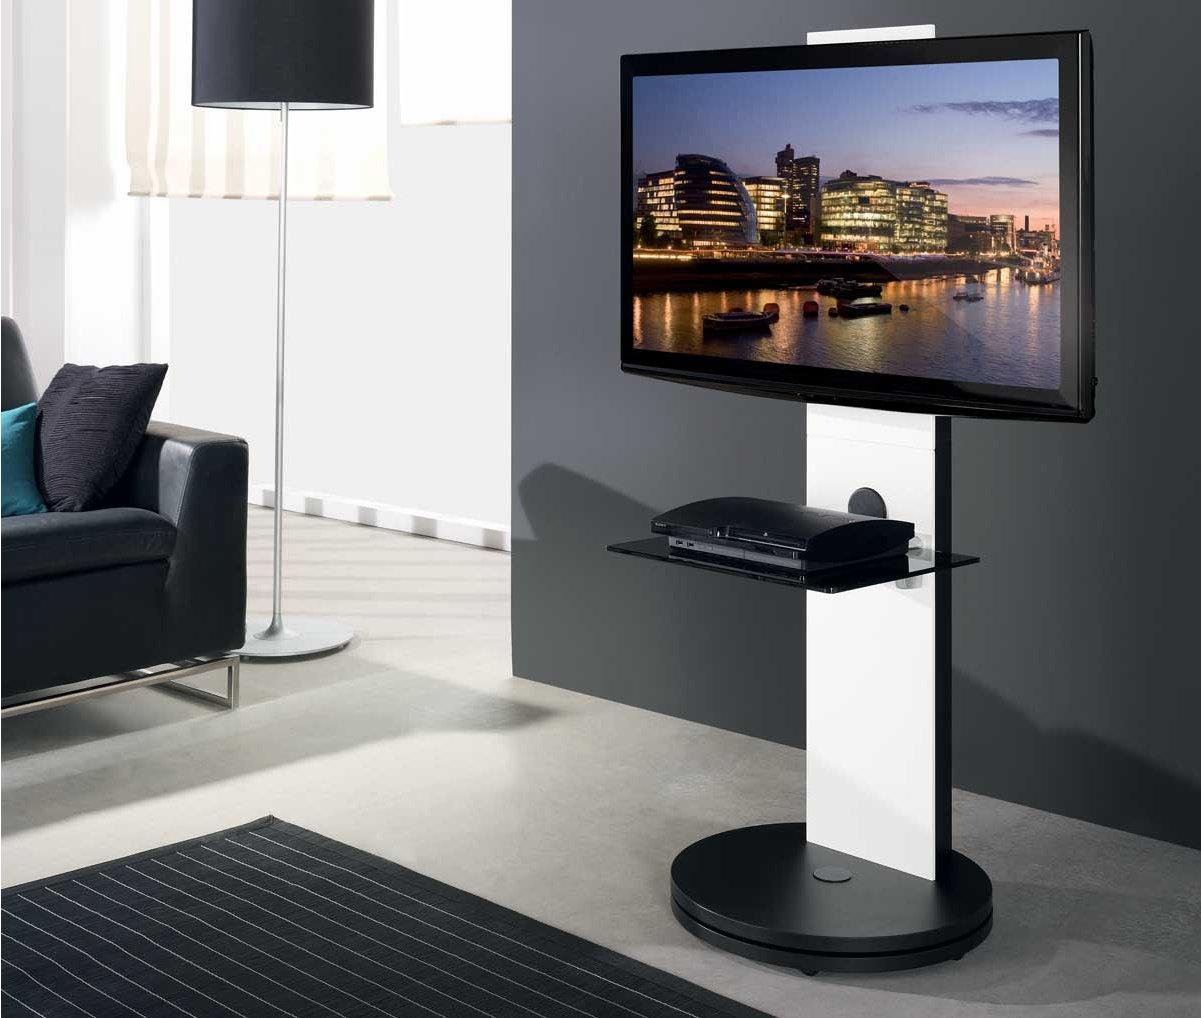 B Tech Btf811 White Corner Cantilever Tv Stand